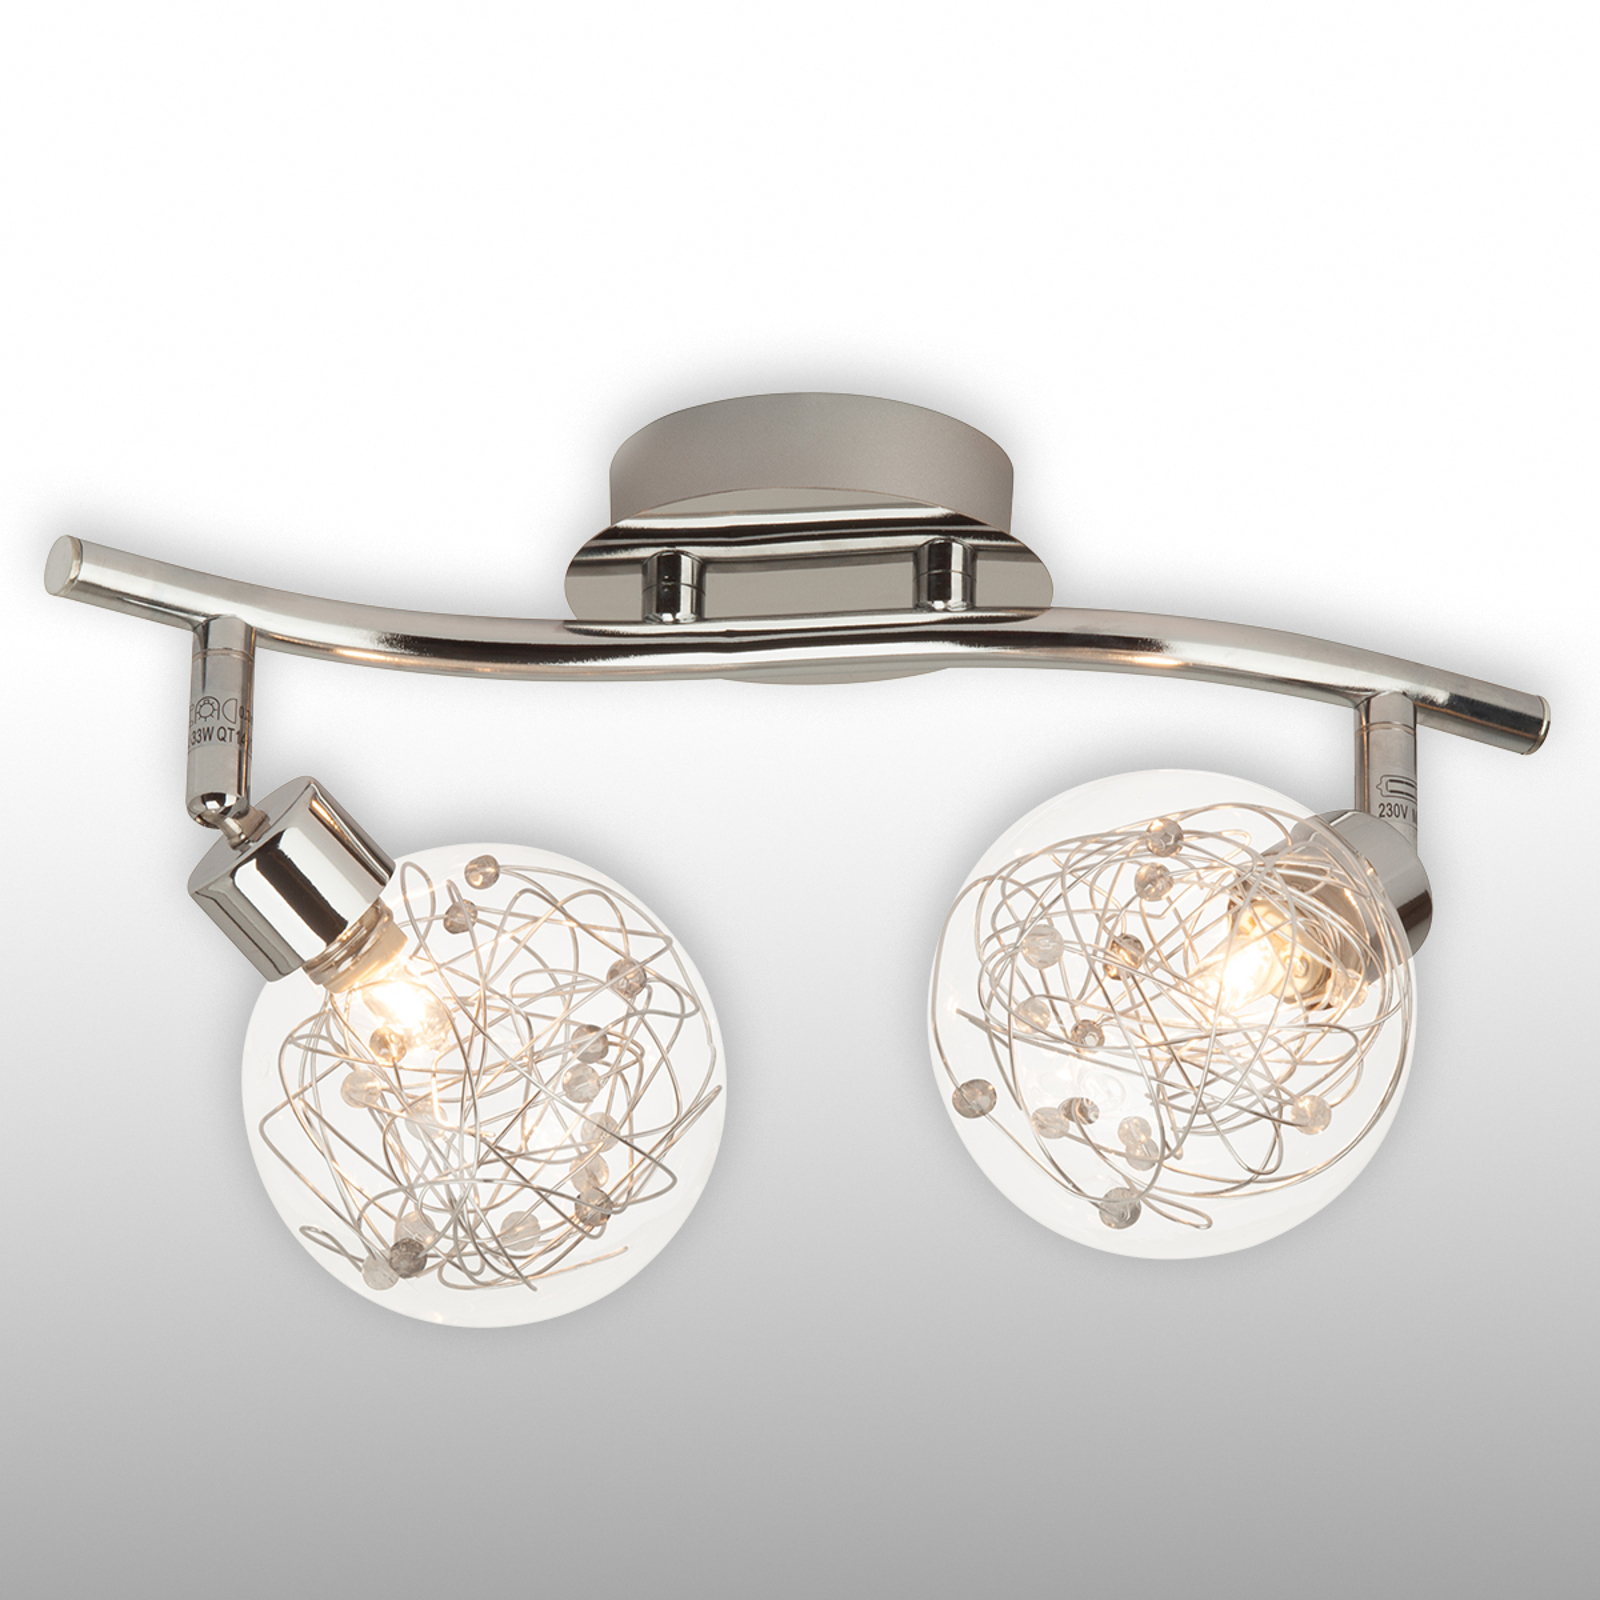 Tweelamps plafondlamp Joya